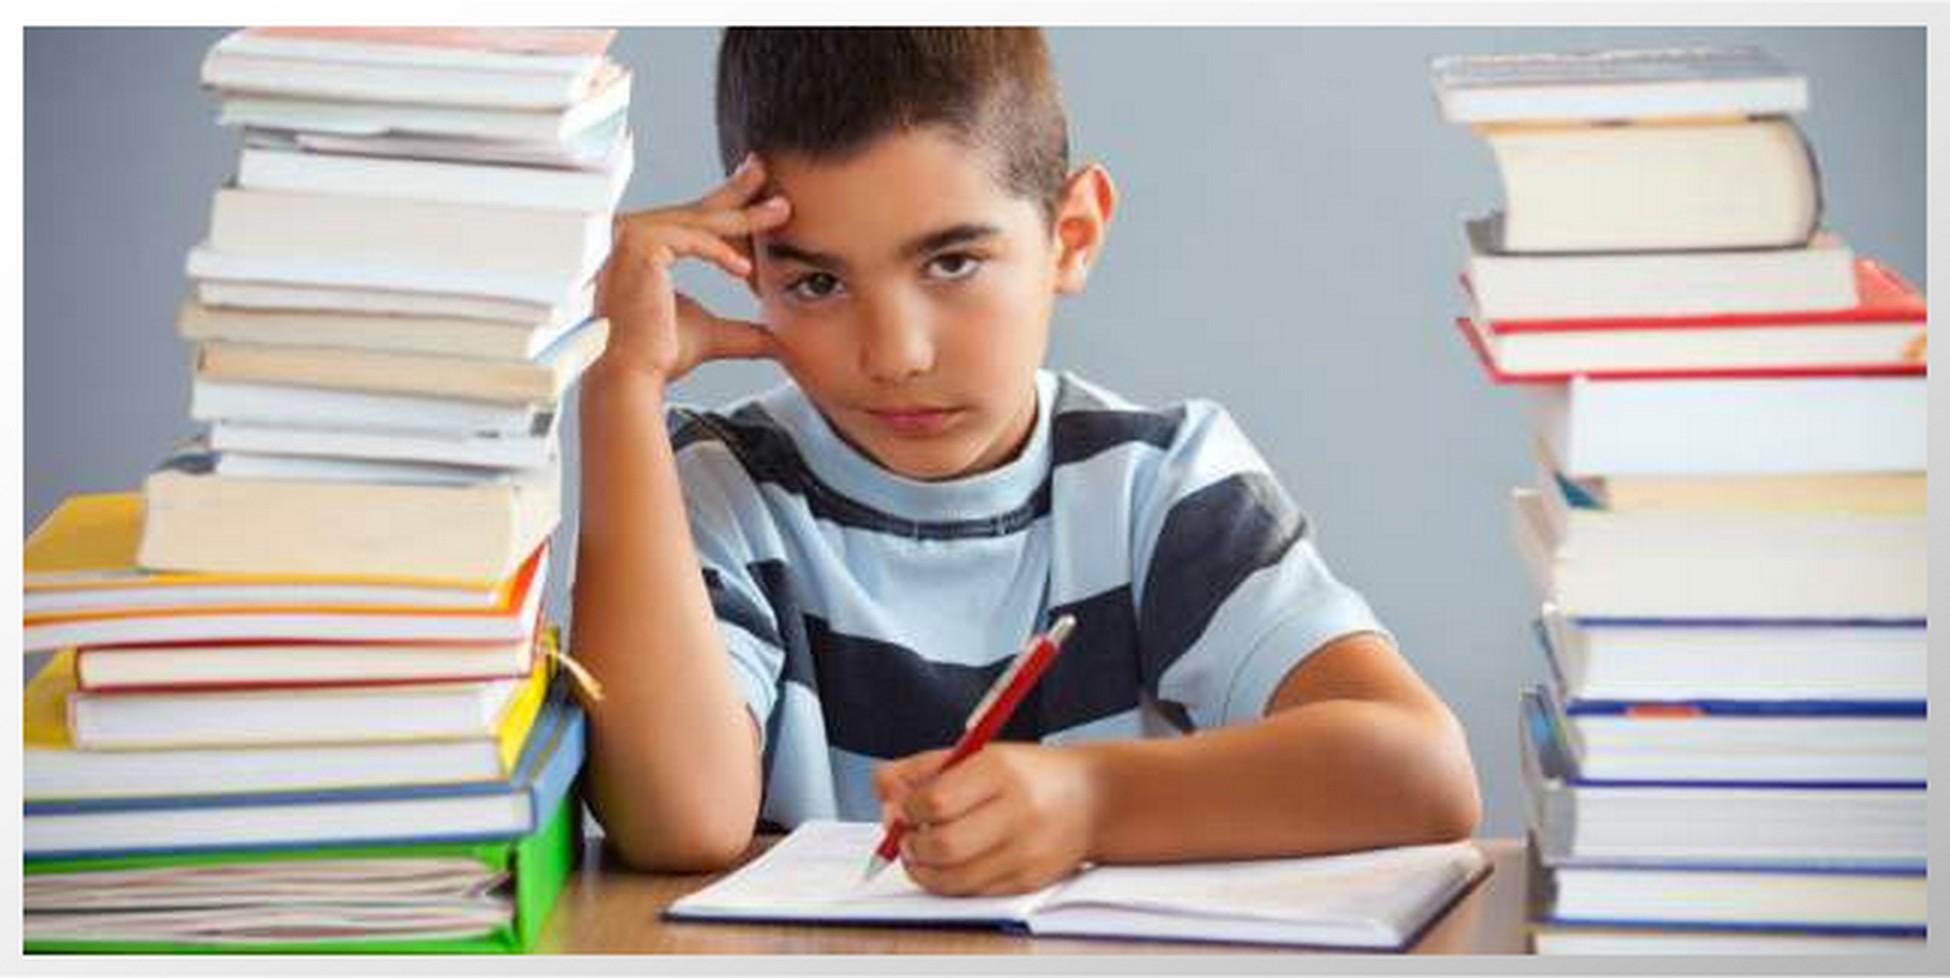 tareas escolares